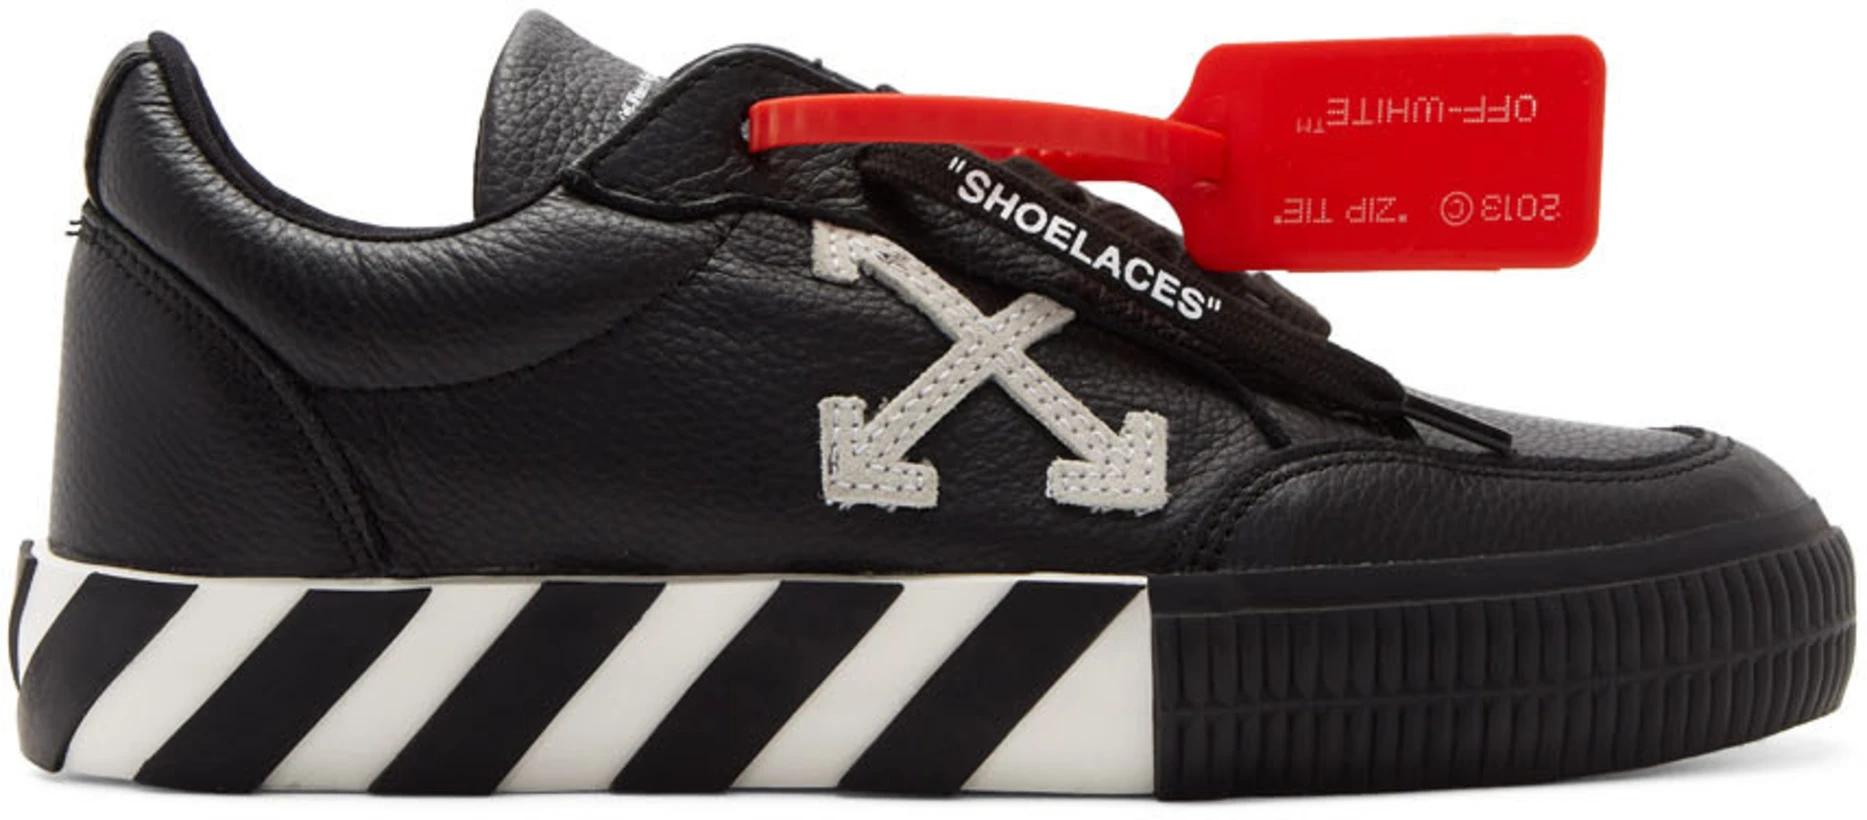 Off-White 黑色Arrow 运动鞋